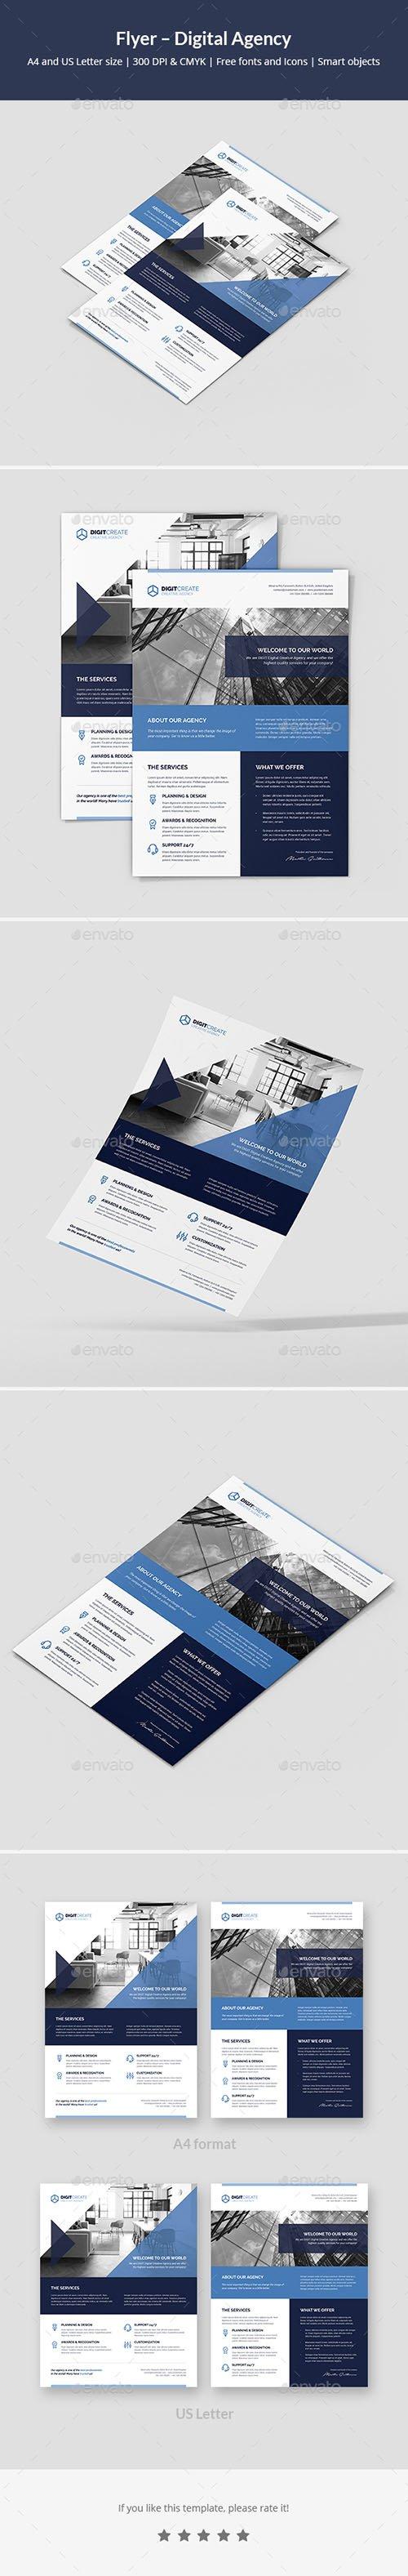 Flyer – Digital Agency 21434737